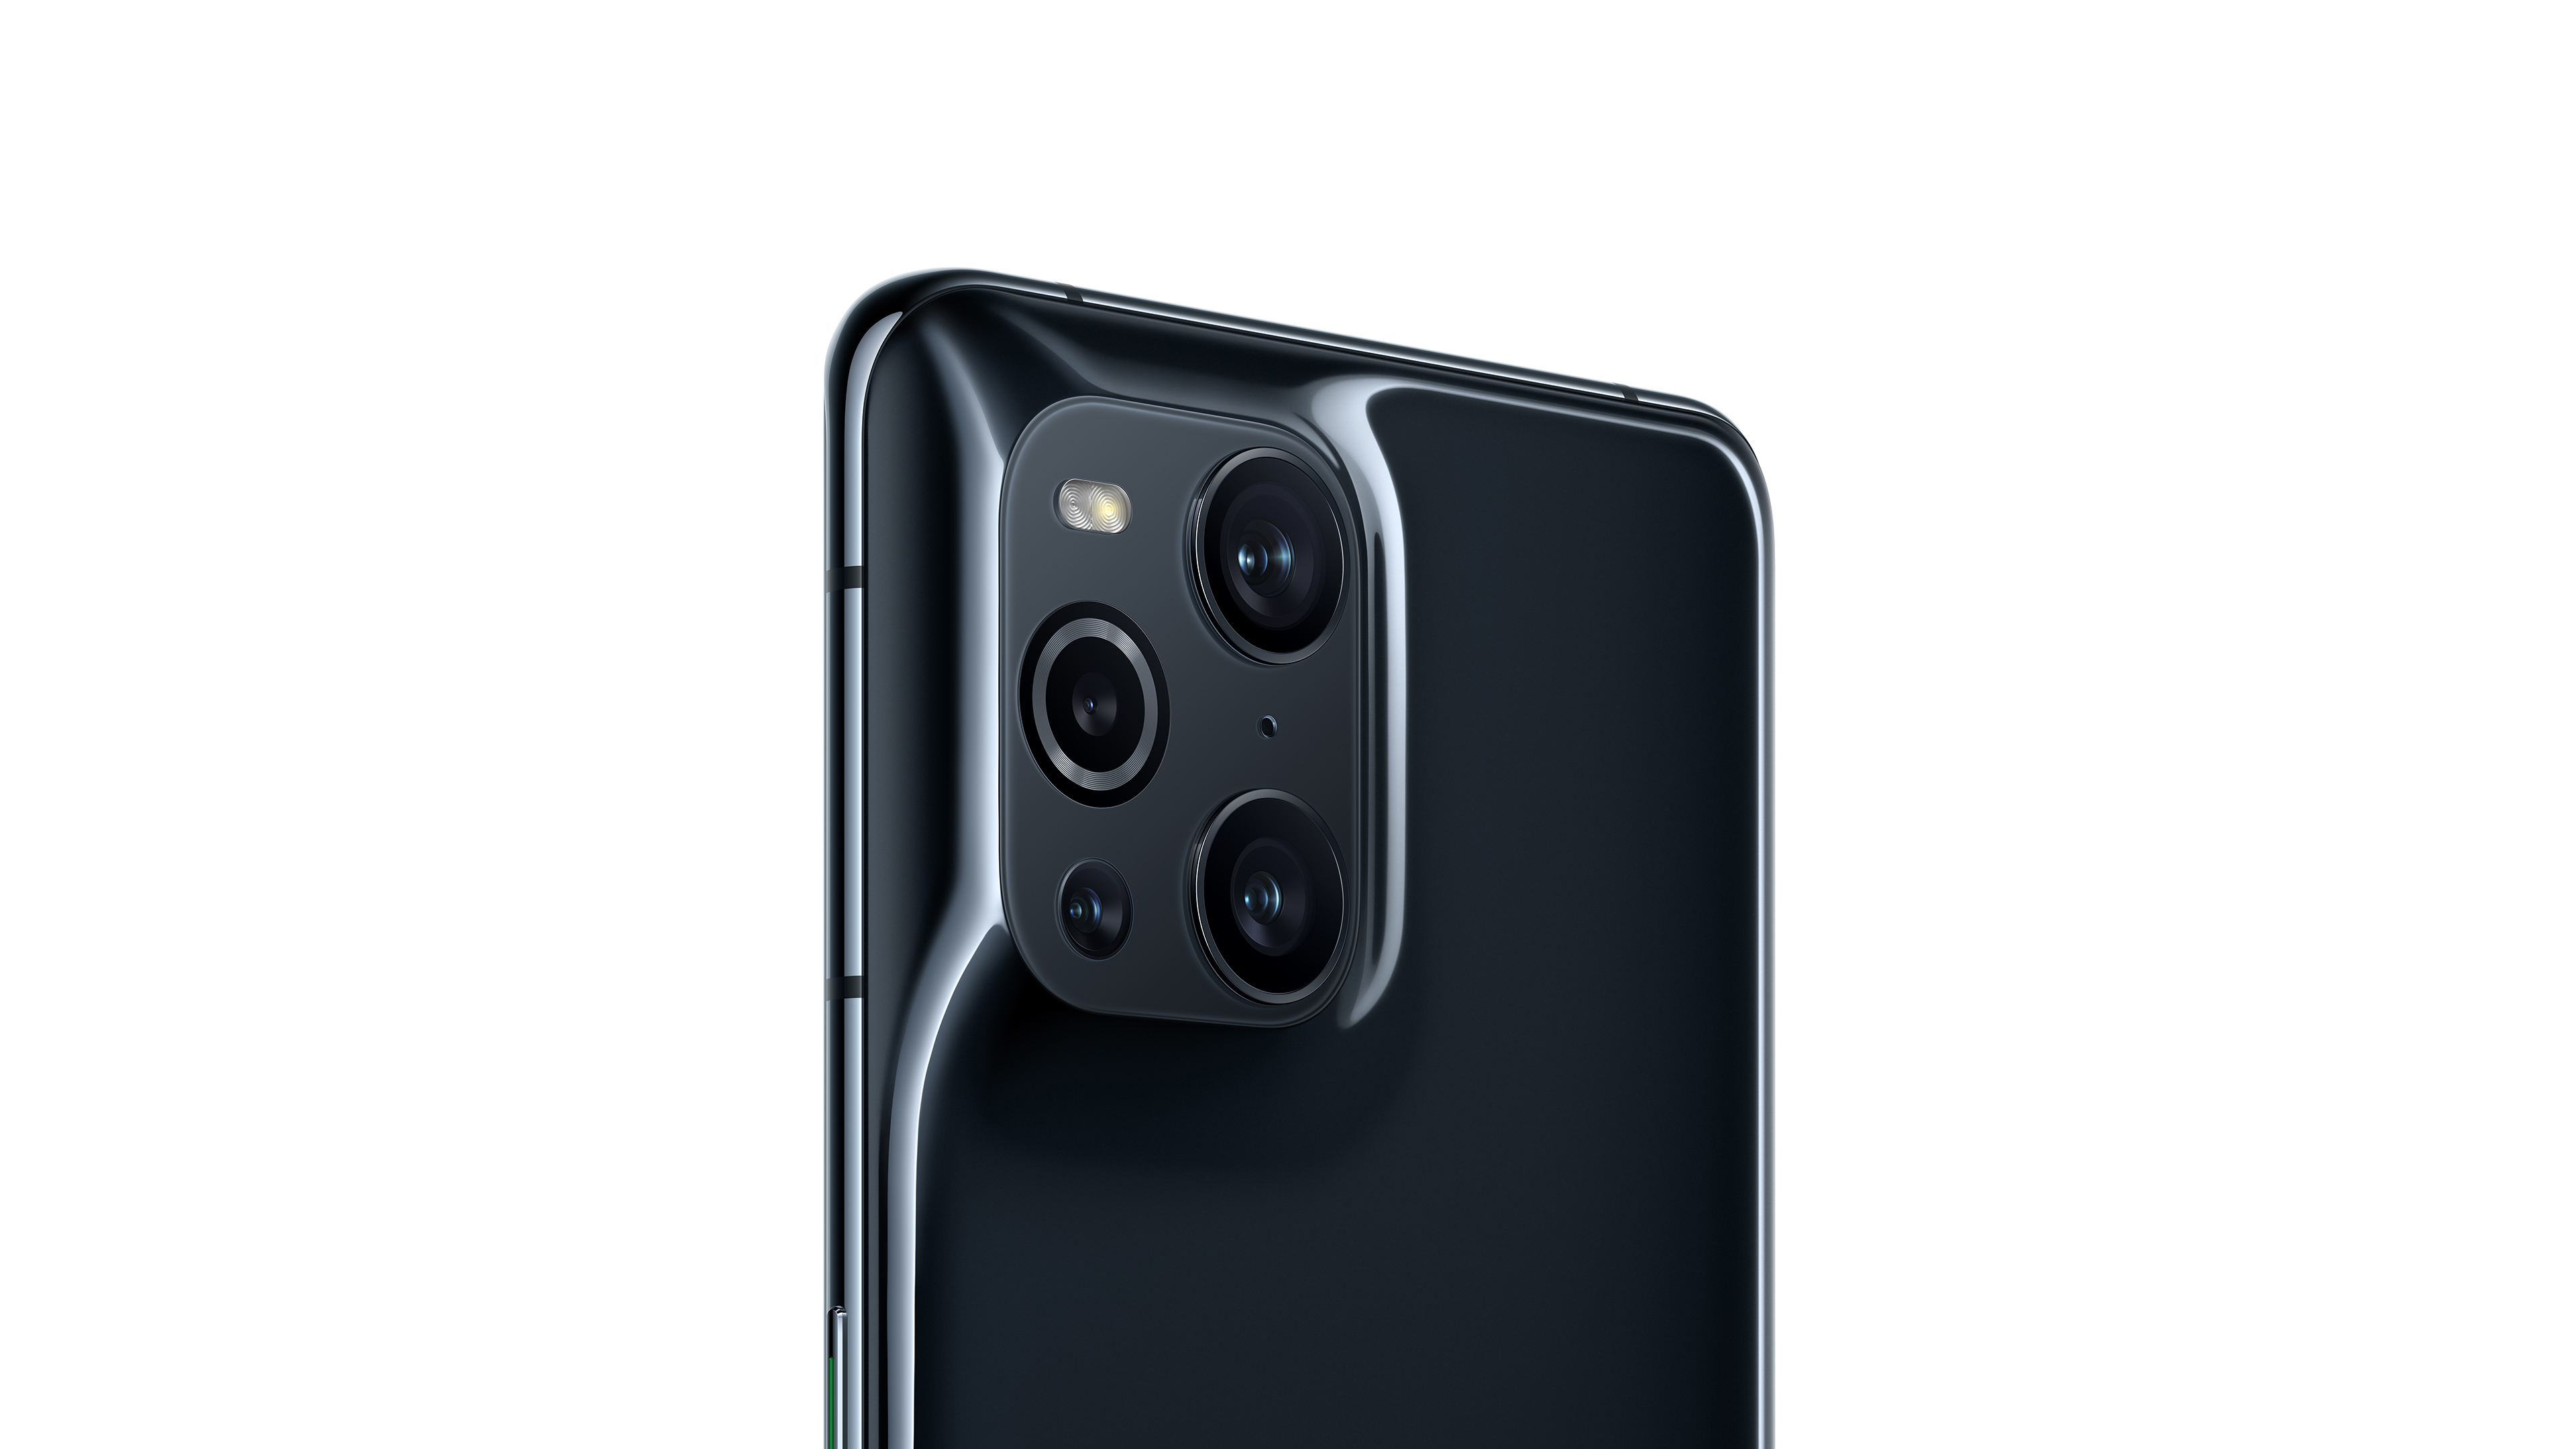 OPP Find X3 Pro Camera